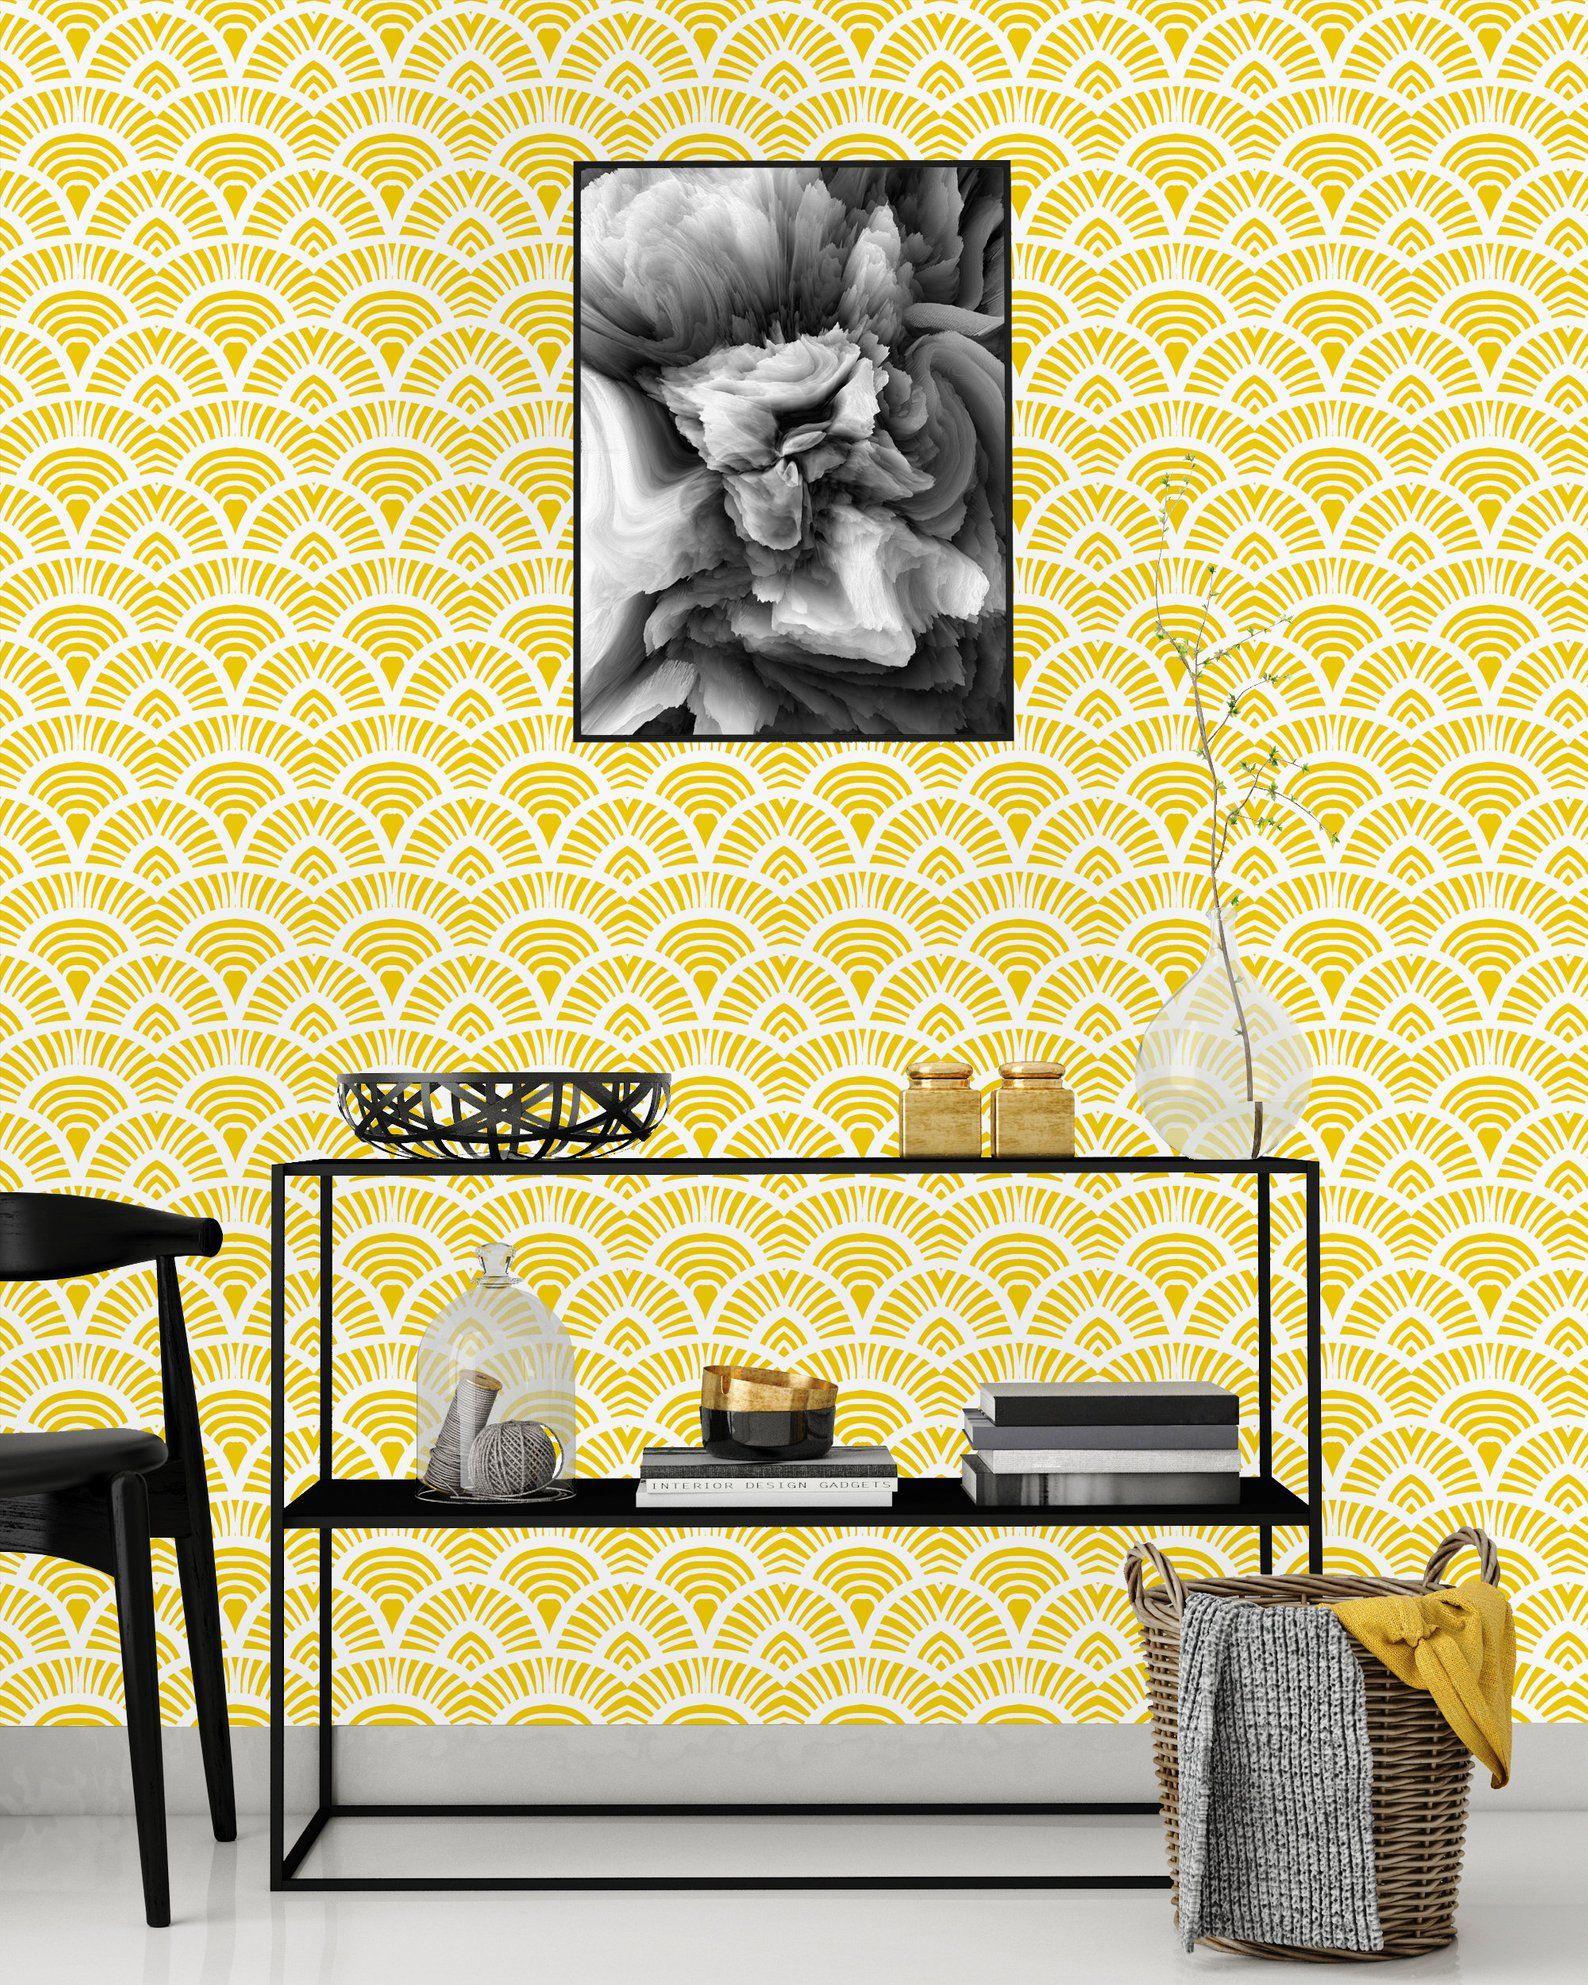 Yellow Geometric Print Removable Wallpaper Peel Stick Mural Nursery Decor Self Adhesive Wallpaper Peel And Stick Wallpaper Wallpaper Panels Nursery Mural